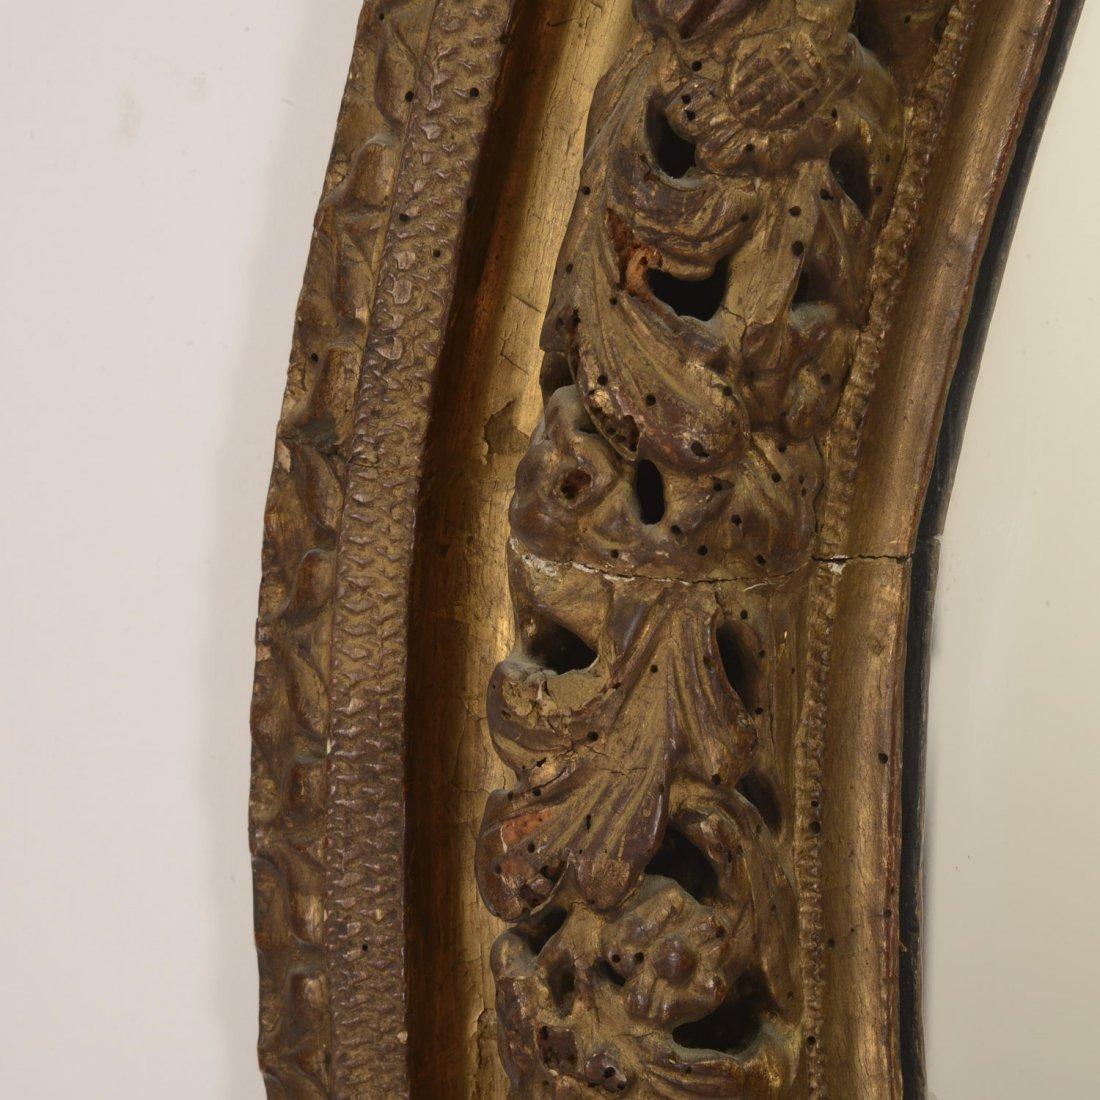 Continental Rococo giltwood oval wall mirror - 4